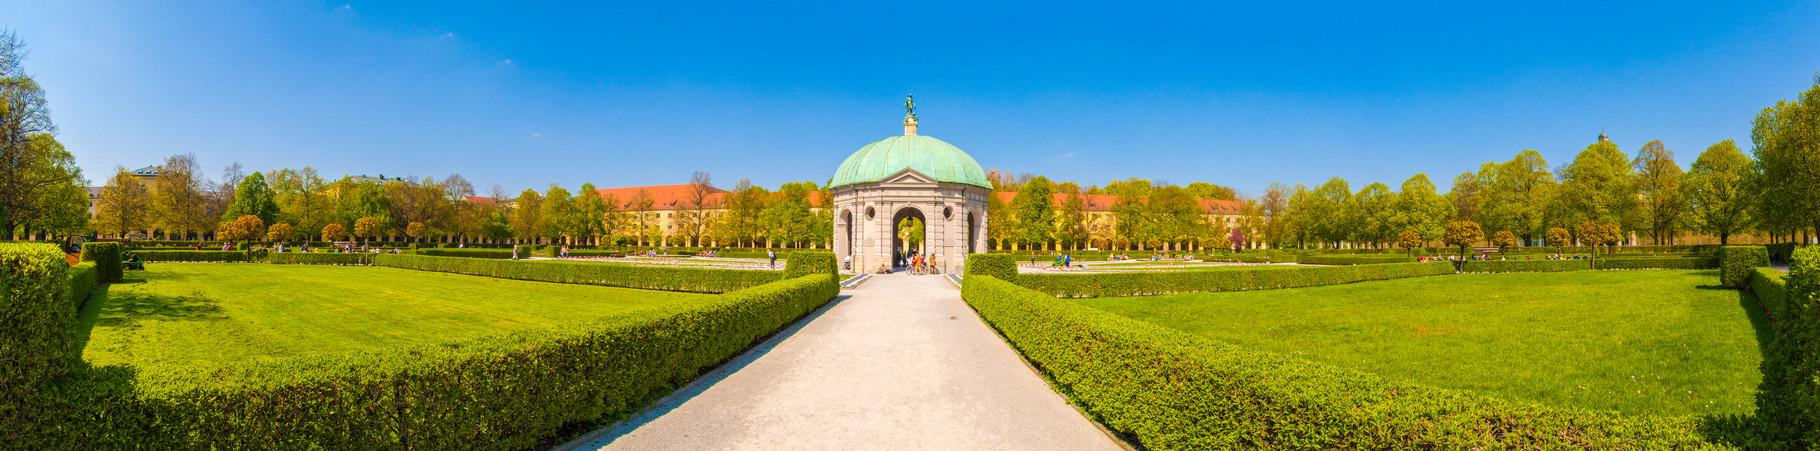 Residenzgarten Munich, Germany.